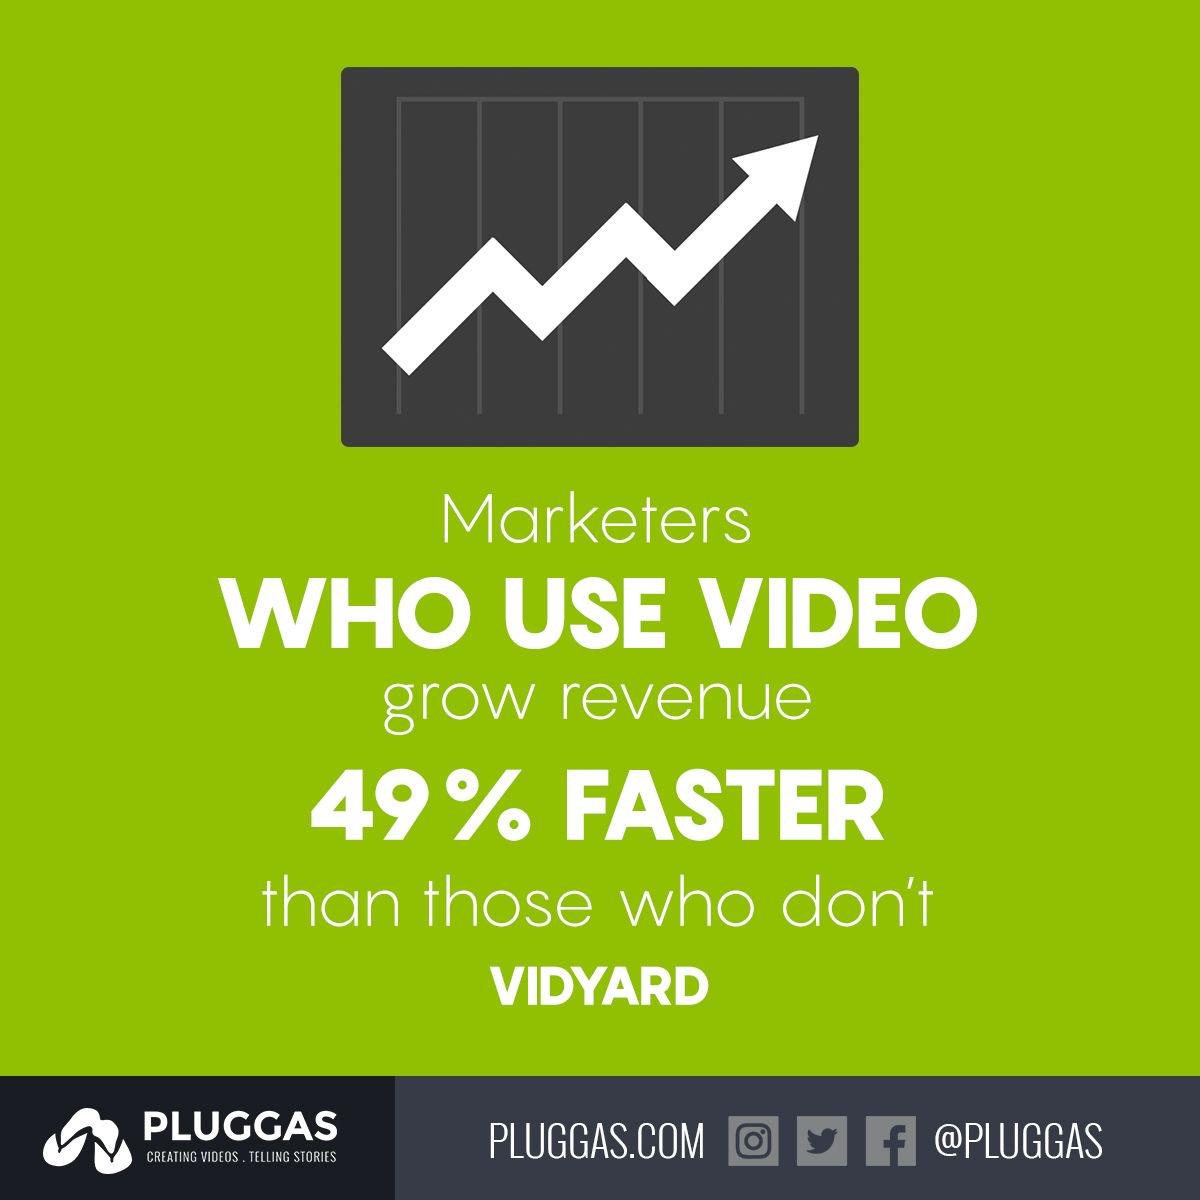 Wanna grow? Think video. :) #VideoMarketing #BusinessGrowth<br>http://pic.twitter.com/VMFGg0XJAZ